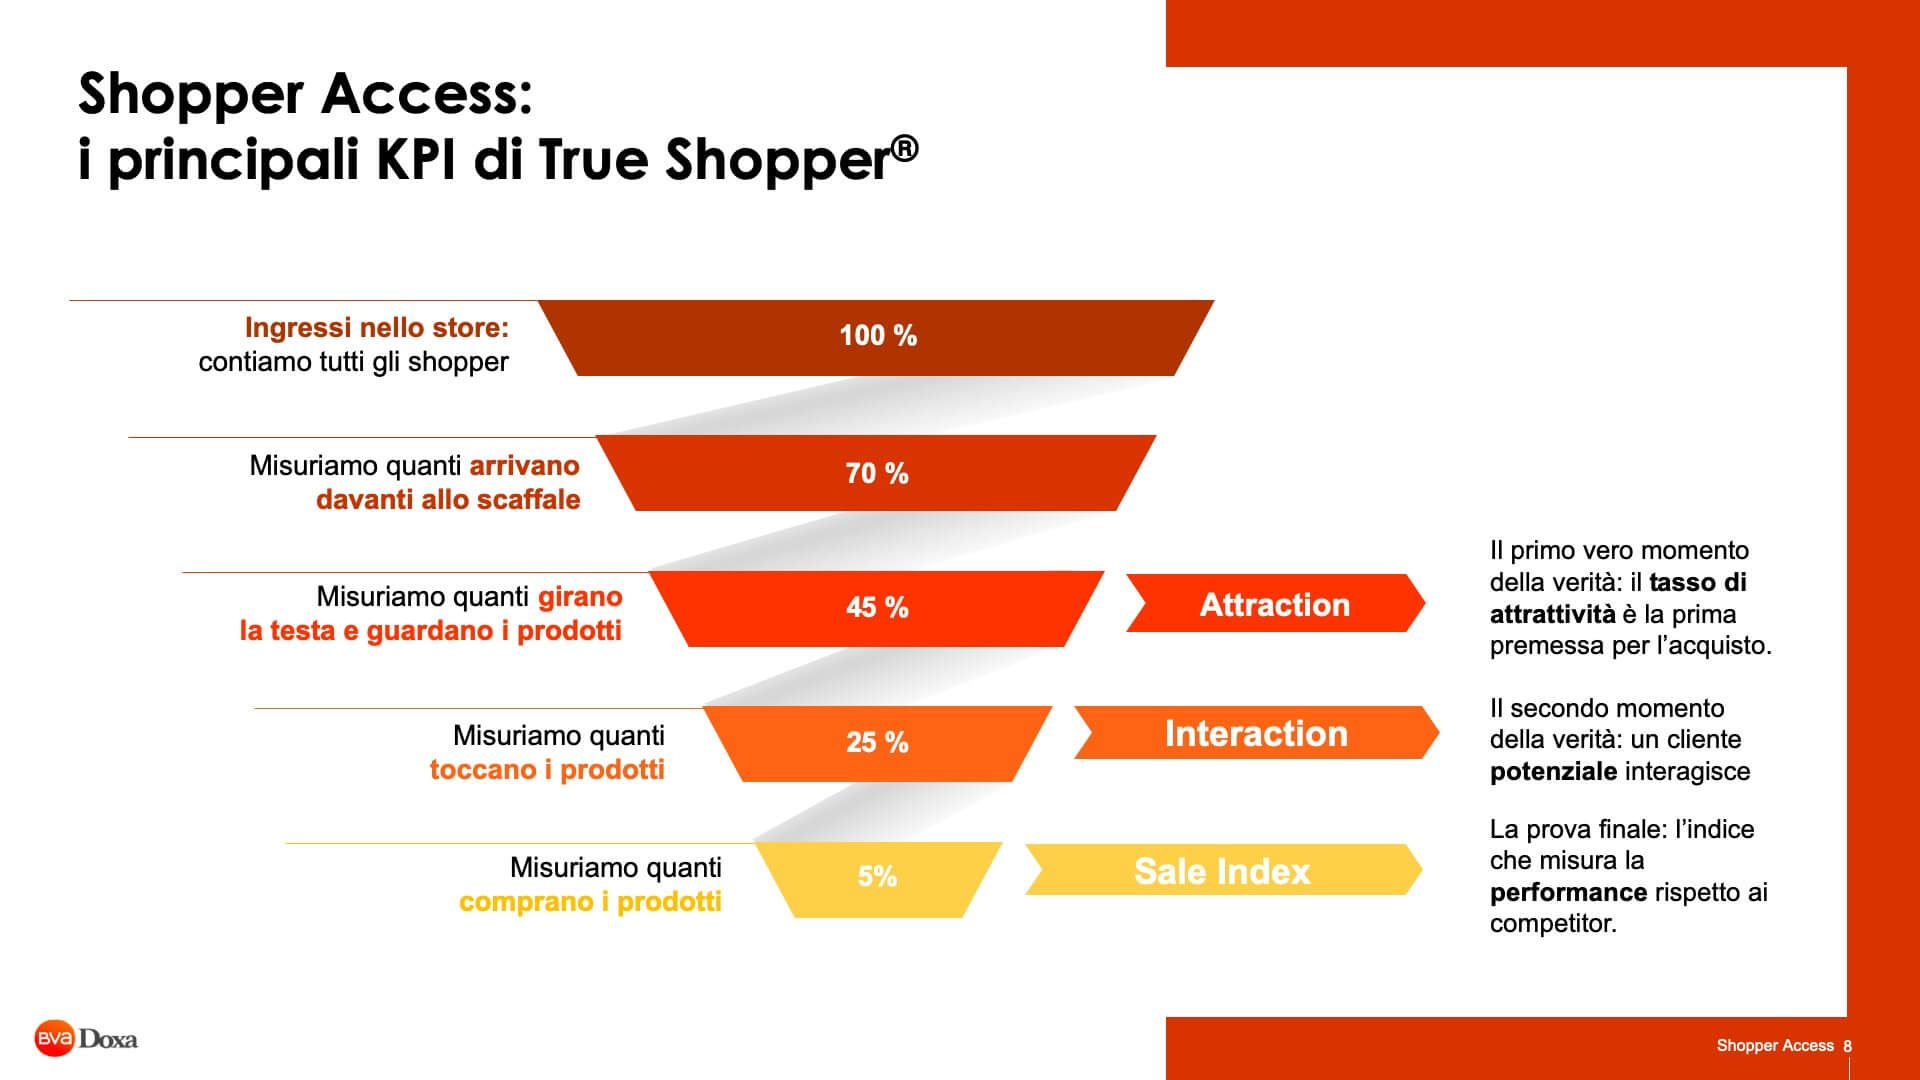 Shopper Access 08